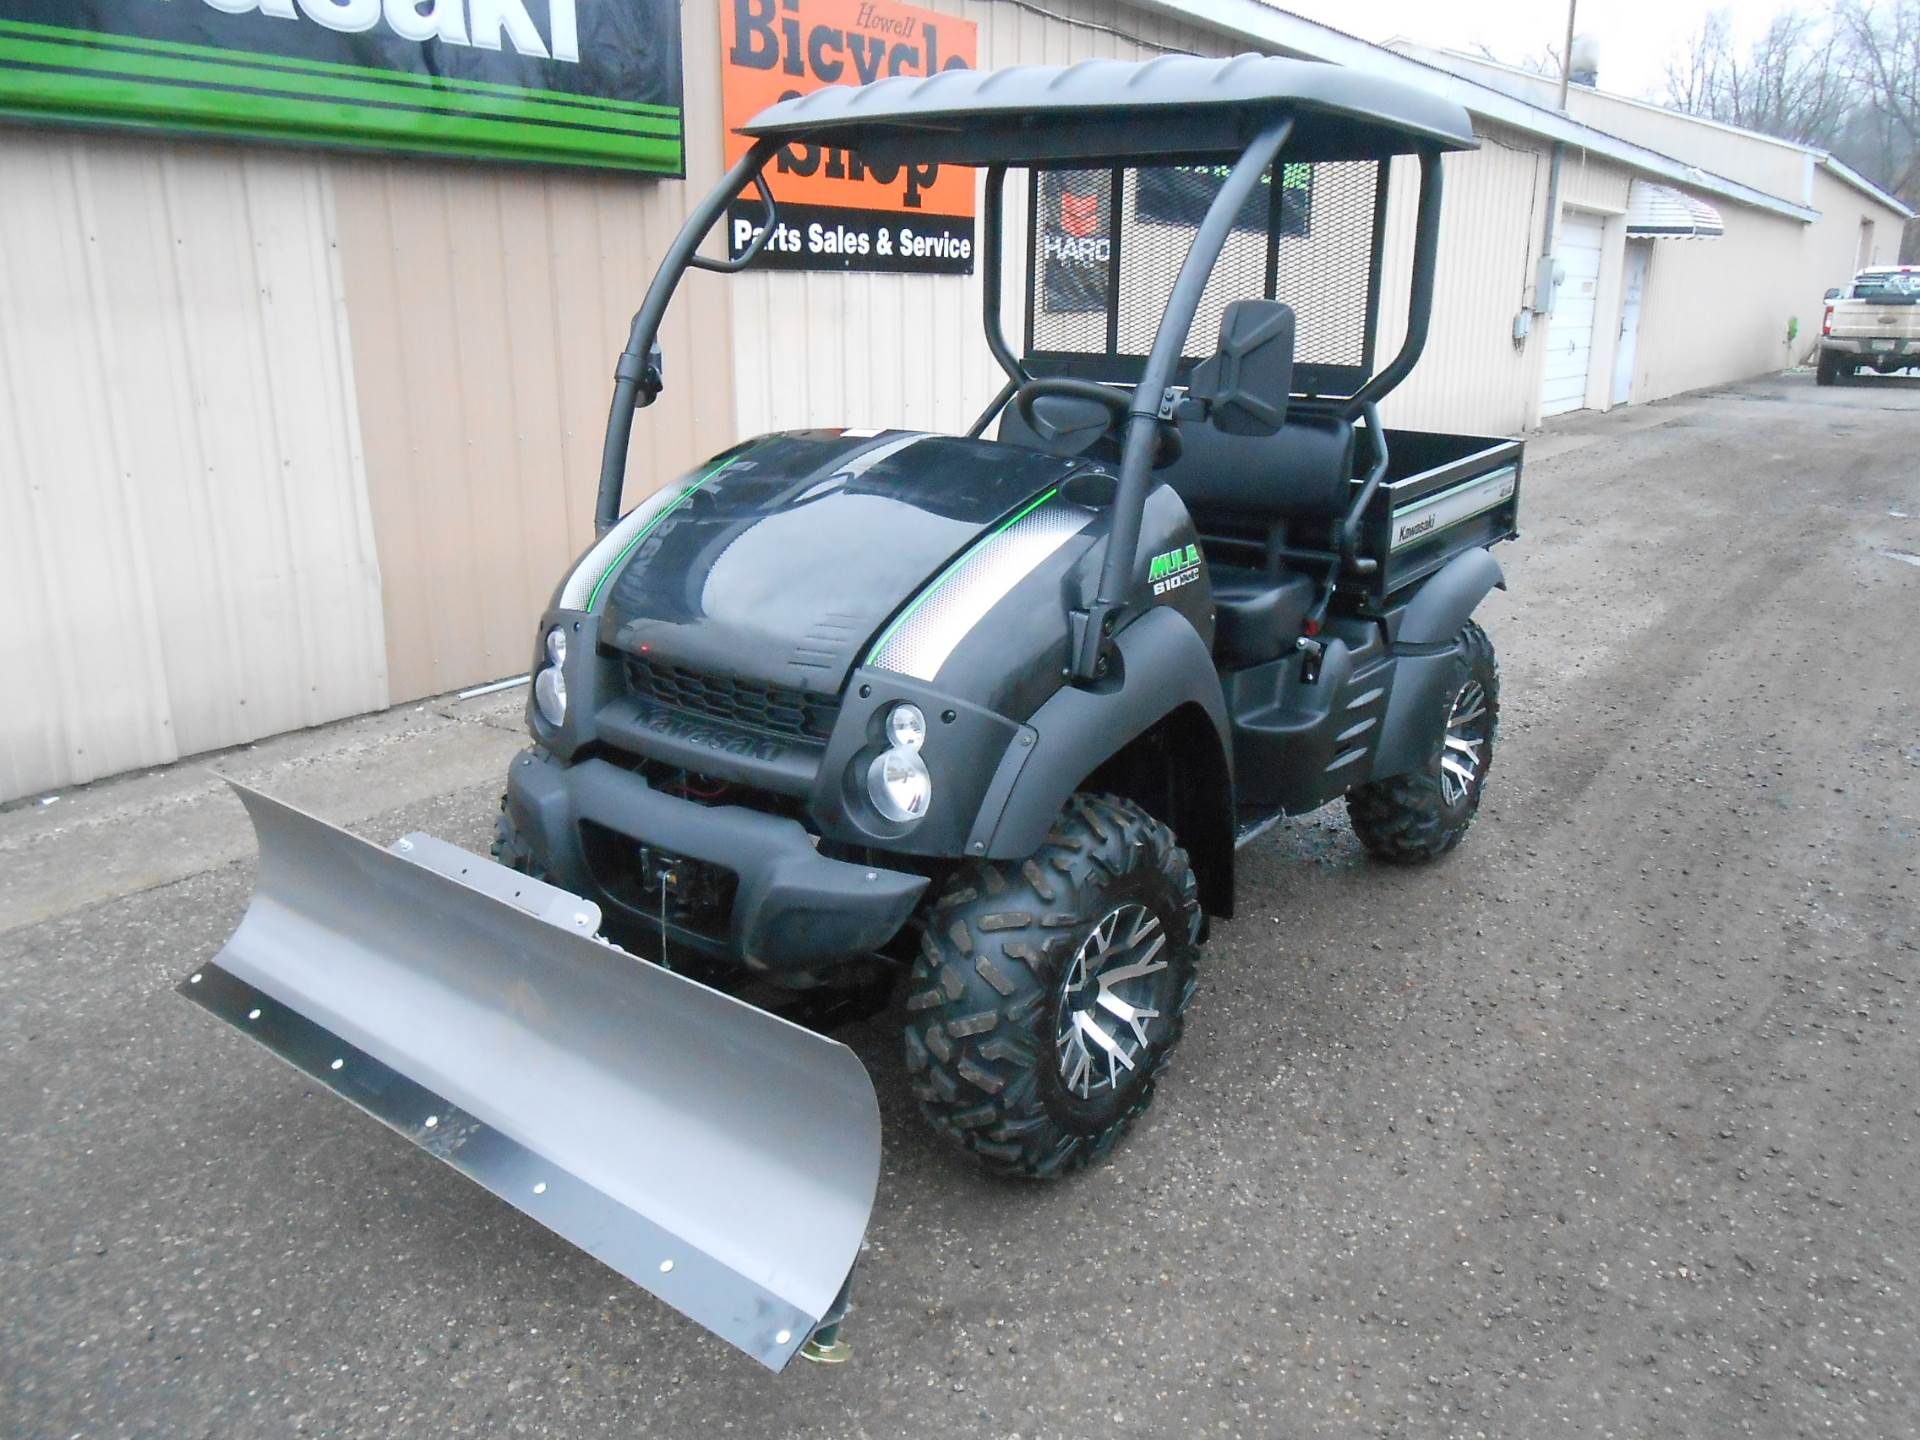 2016 Mule 610 4x4 XC SE